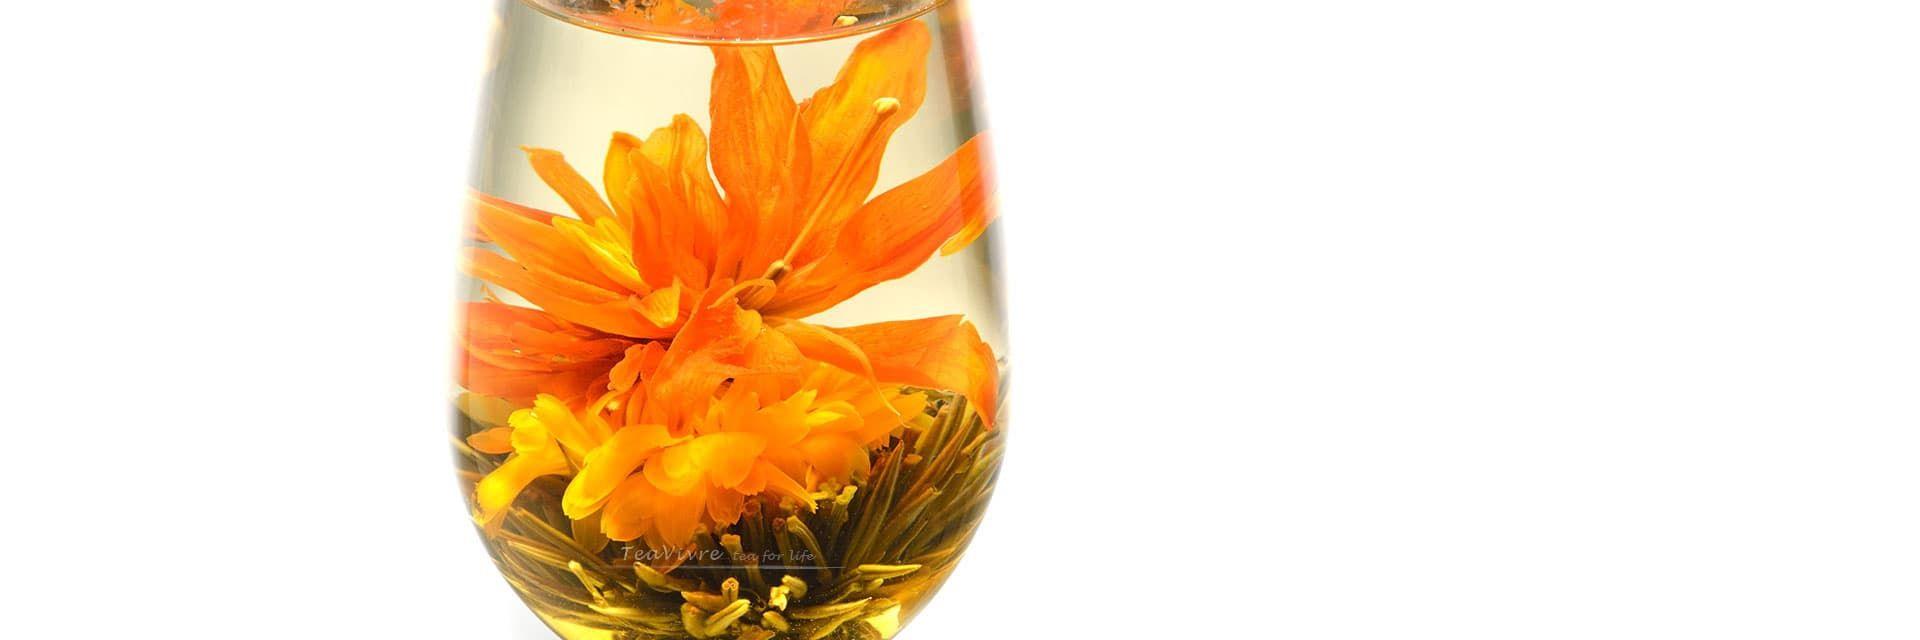 Elegant Blooming Tea Royal Lily Silver Needle Flower Tea